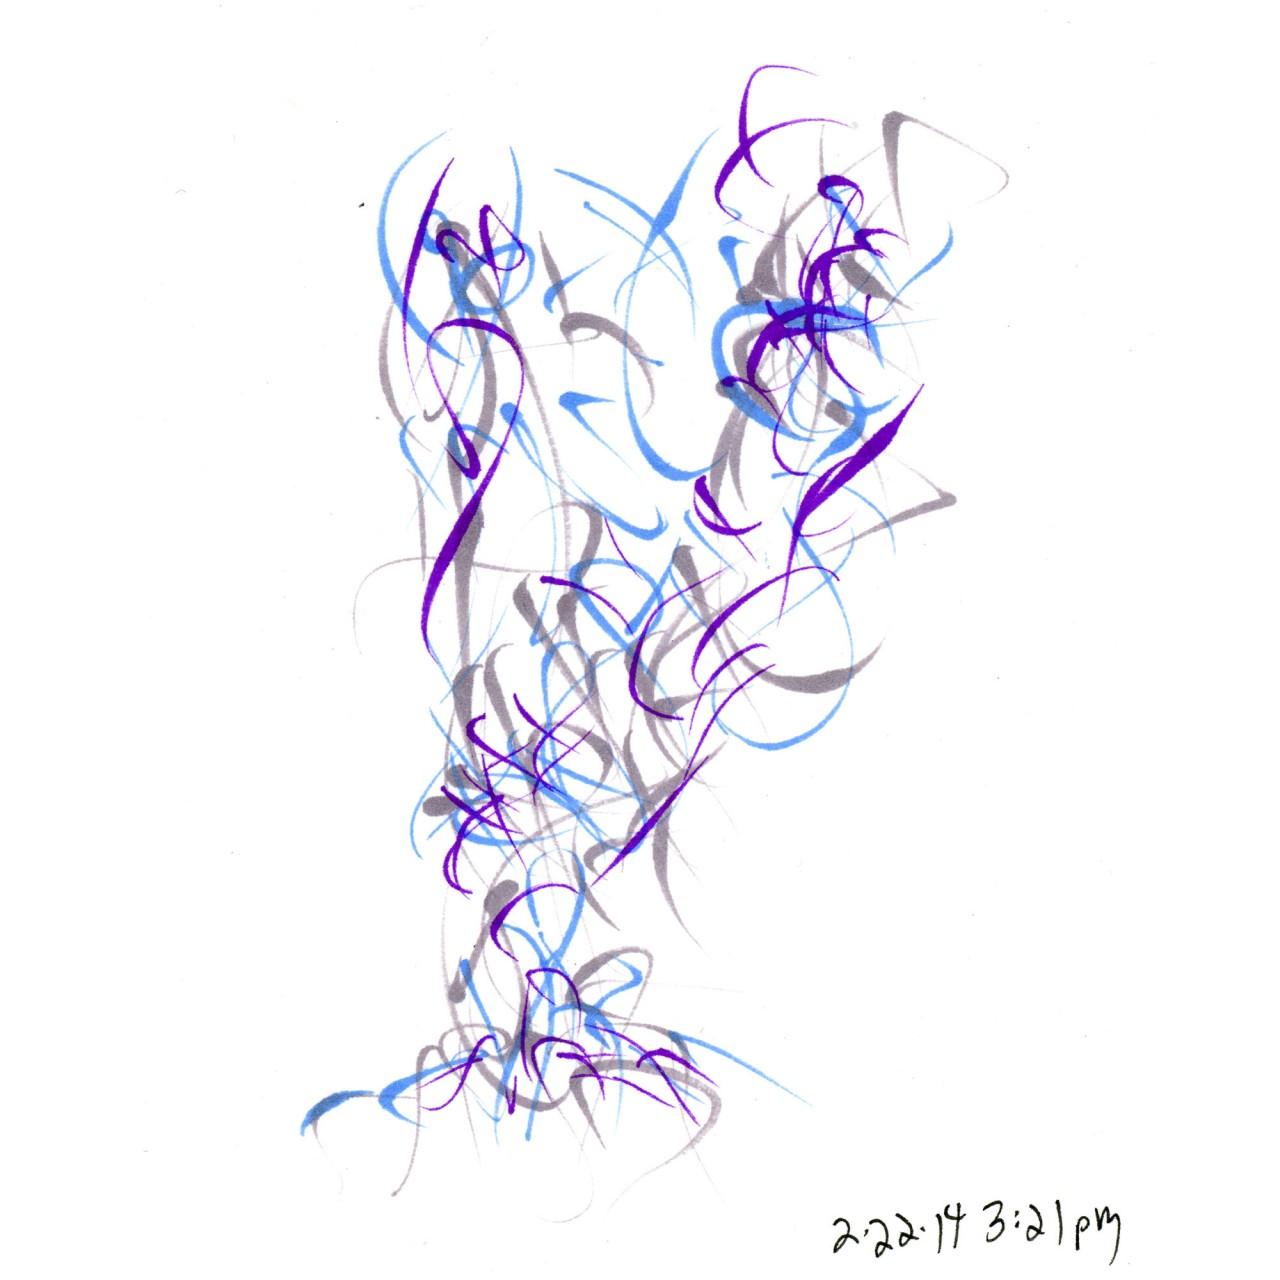 2014-02-22_03-21pm